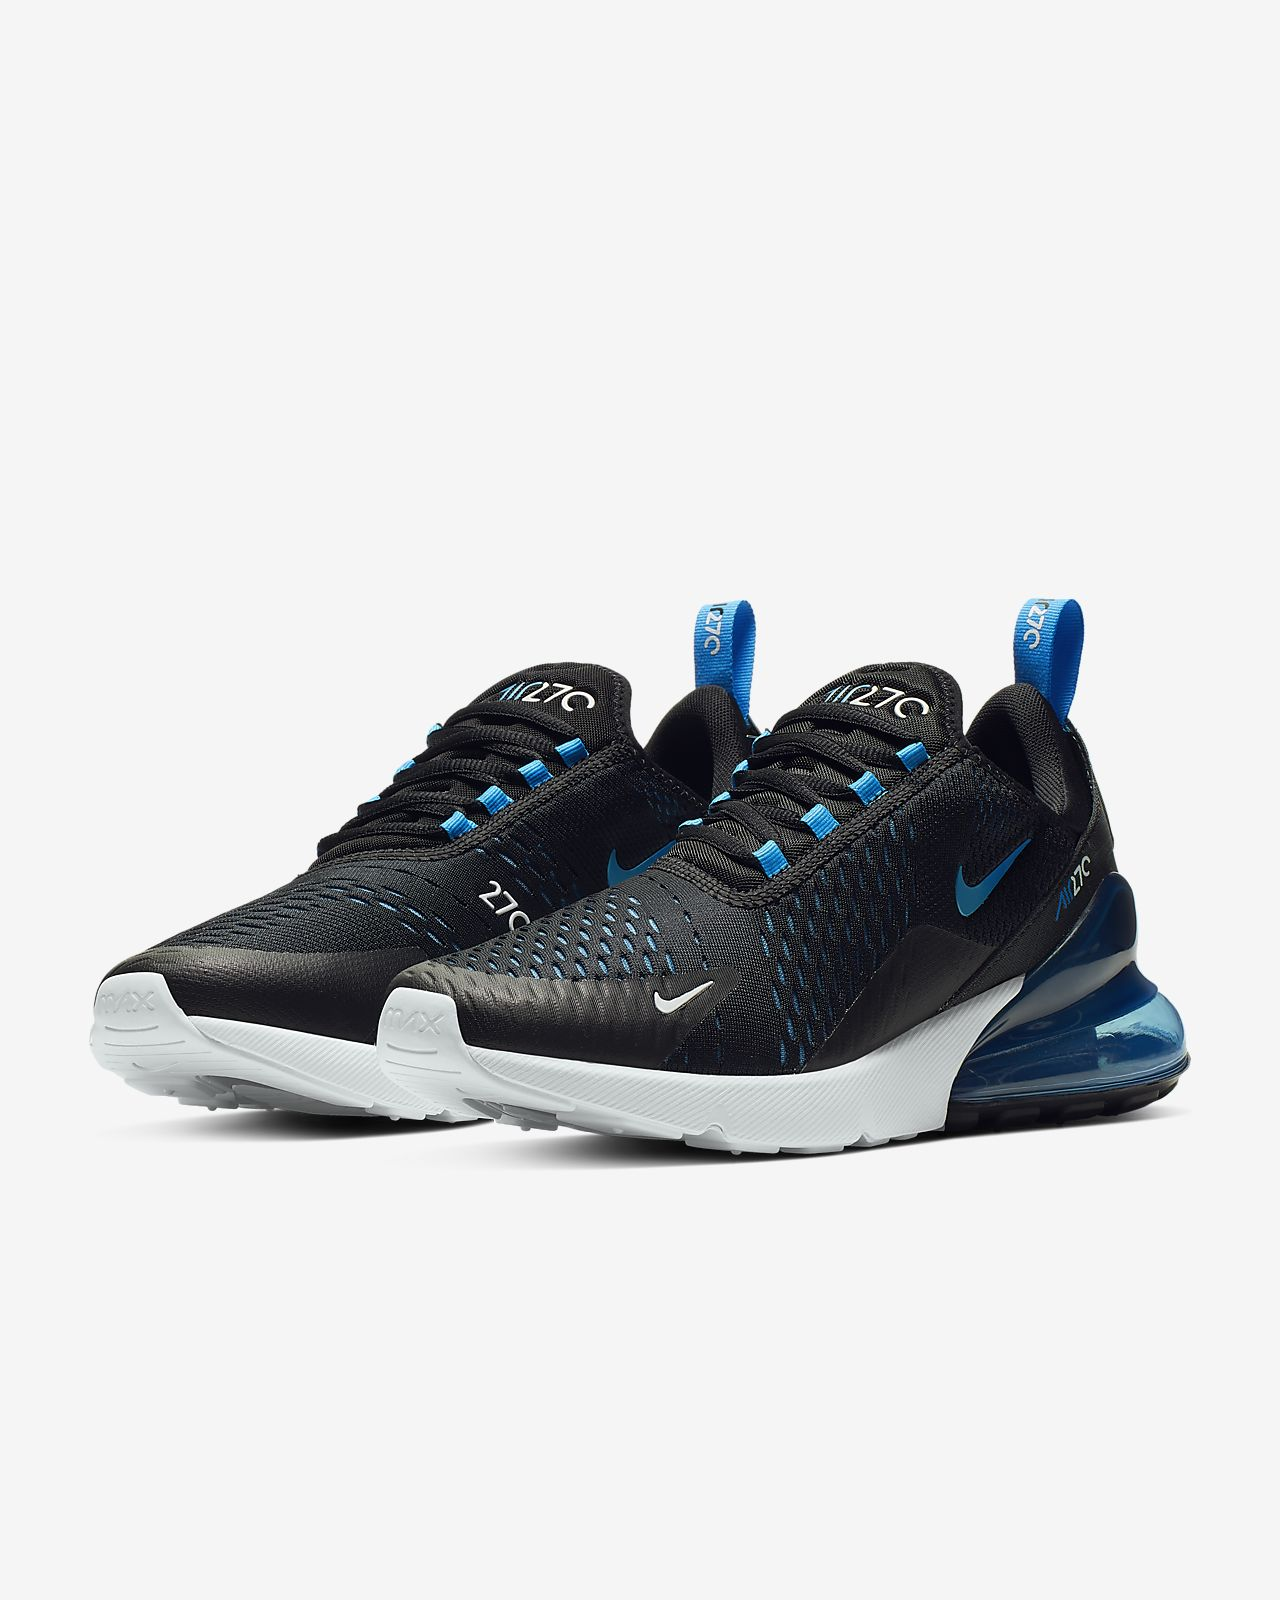 new concept a719a d6778 ... Nike Air Max 270 Zapatillas - Hombre